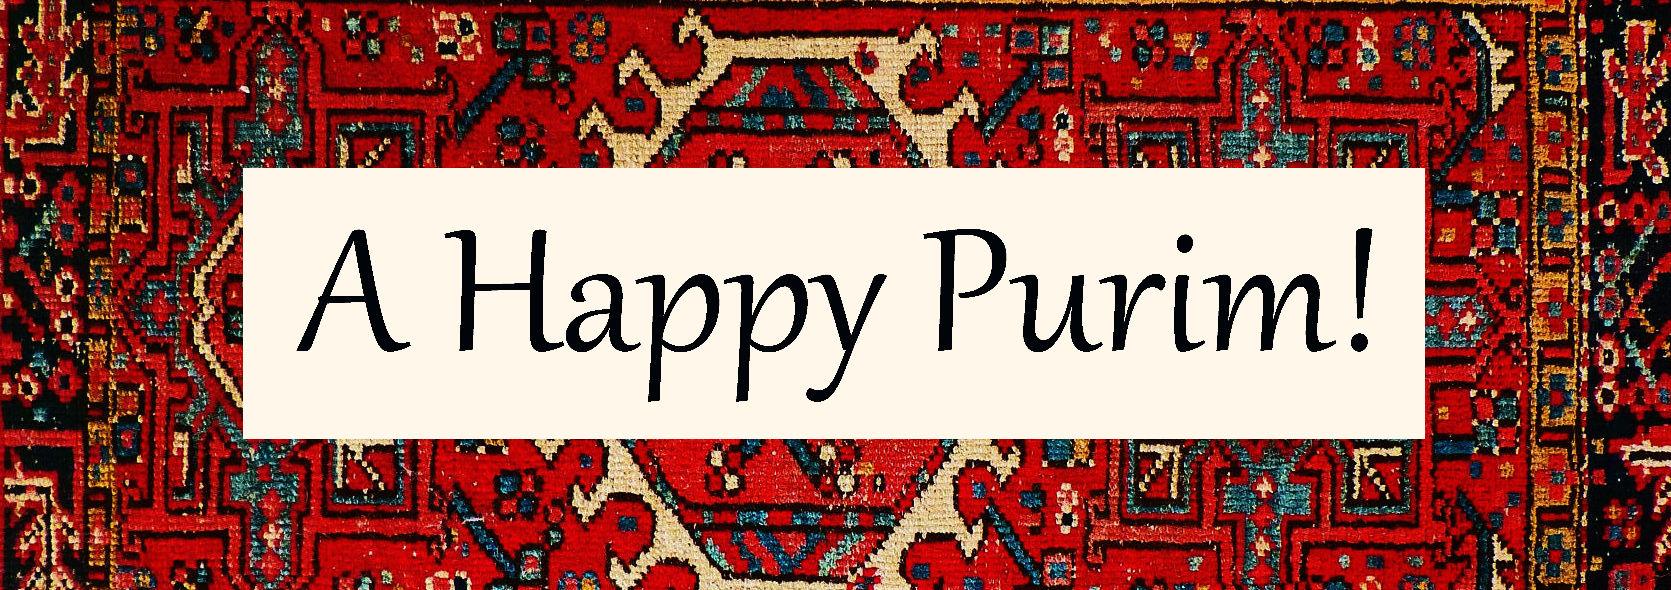 A Happy Purim_carpetsign_banner_t